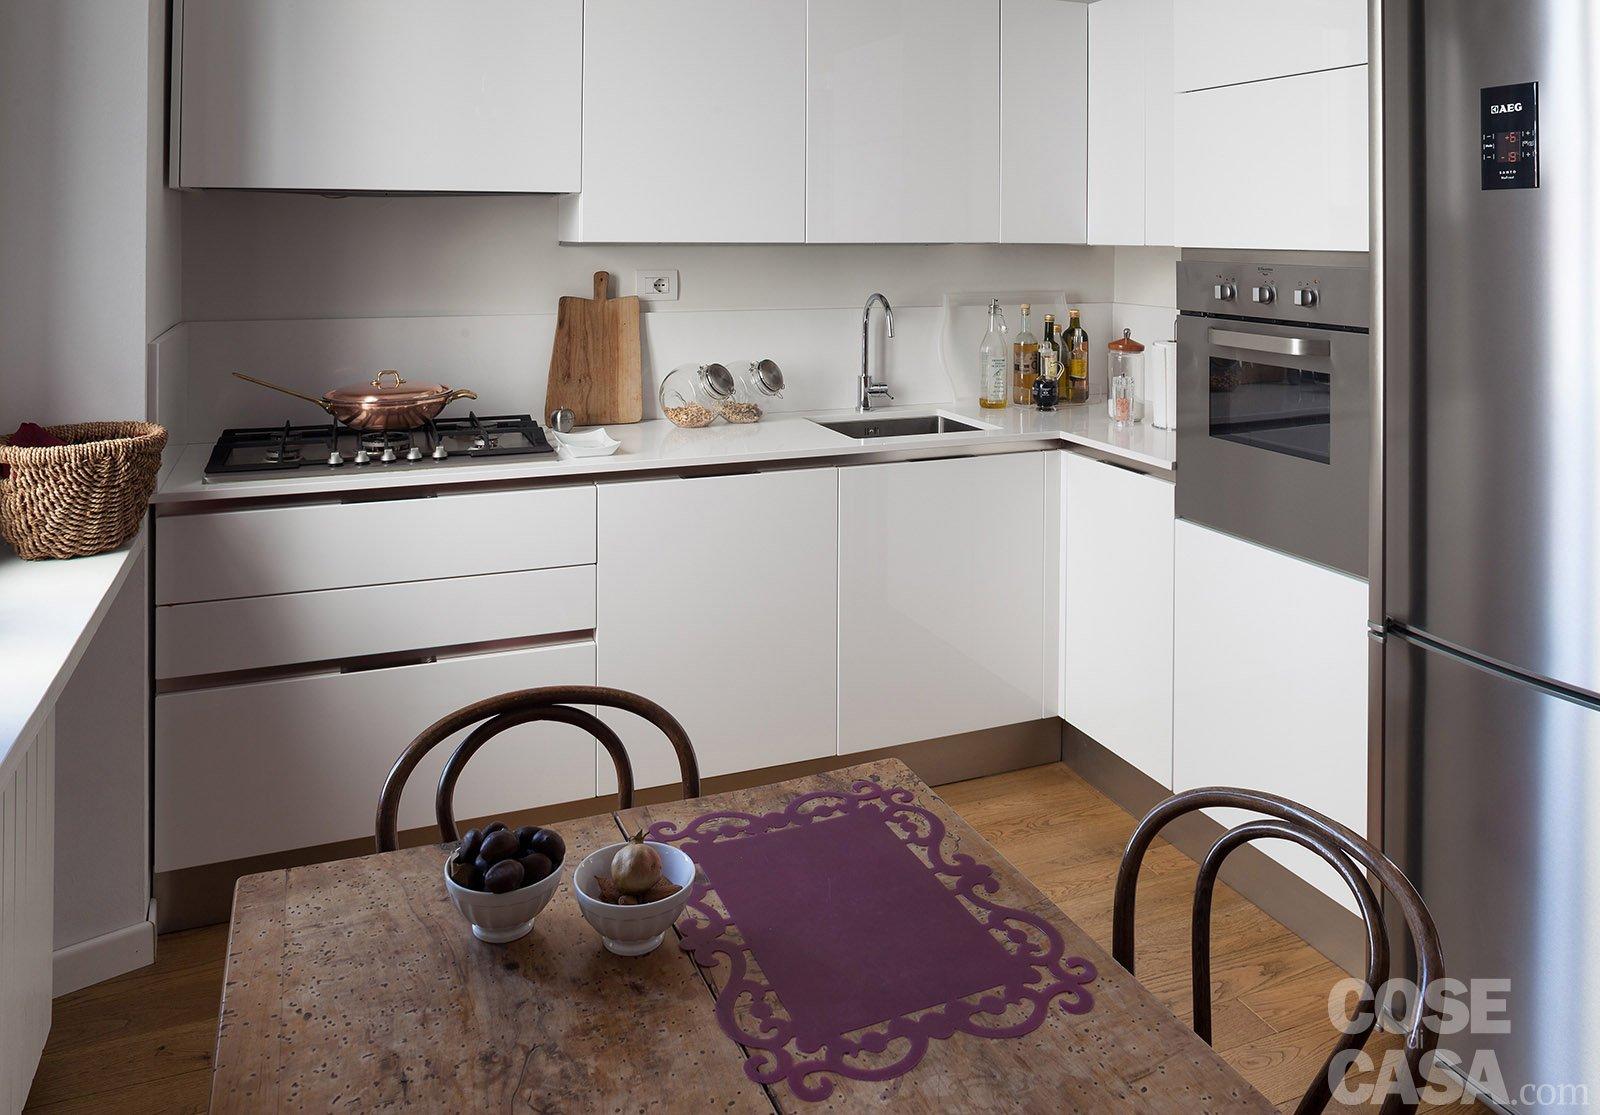 Cucina Ad Angolo Usata : Cucine A Angolo Usate. Cucina Ad Angolo Usata  #4A5E81 1600 1115 Panca Angolare Moderna Per Cucina